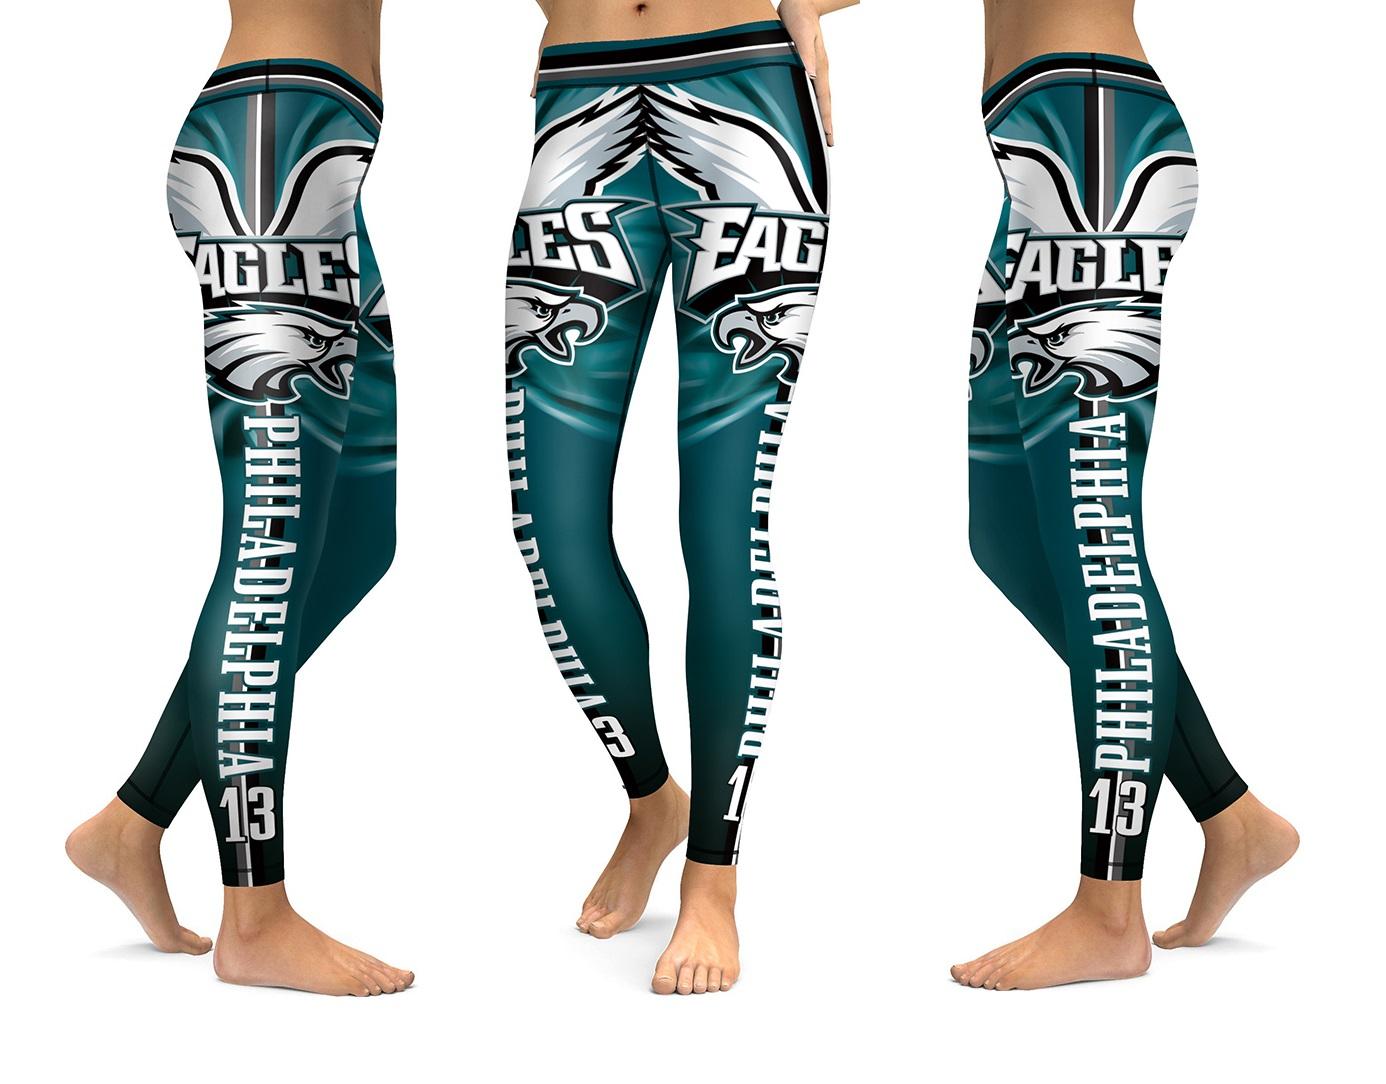 d8a3df7d58a Philadelphia Eagles NFL High Quality Sports Leggings on Storenvy